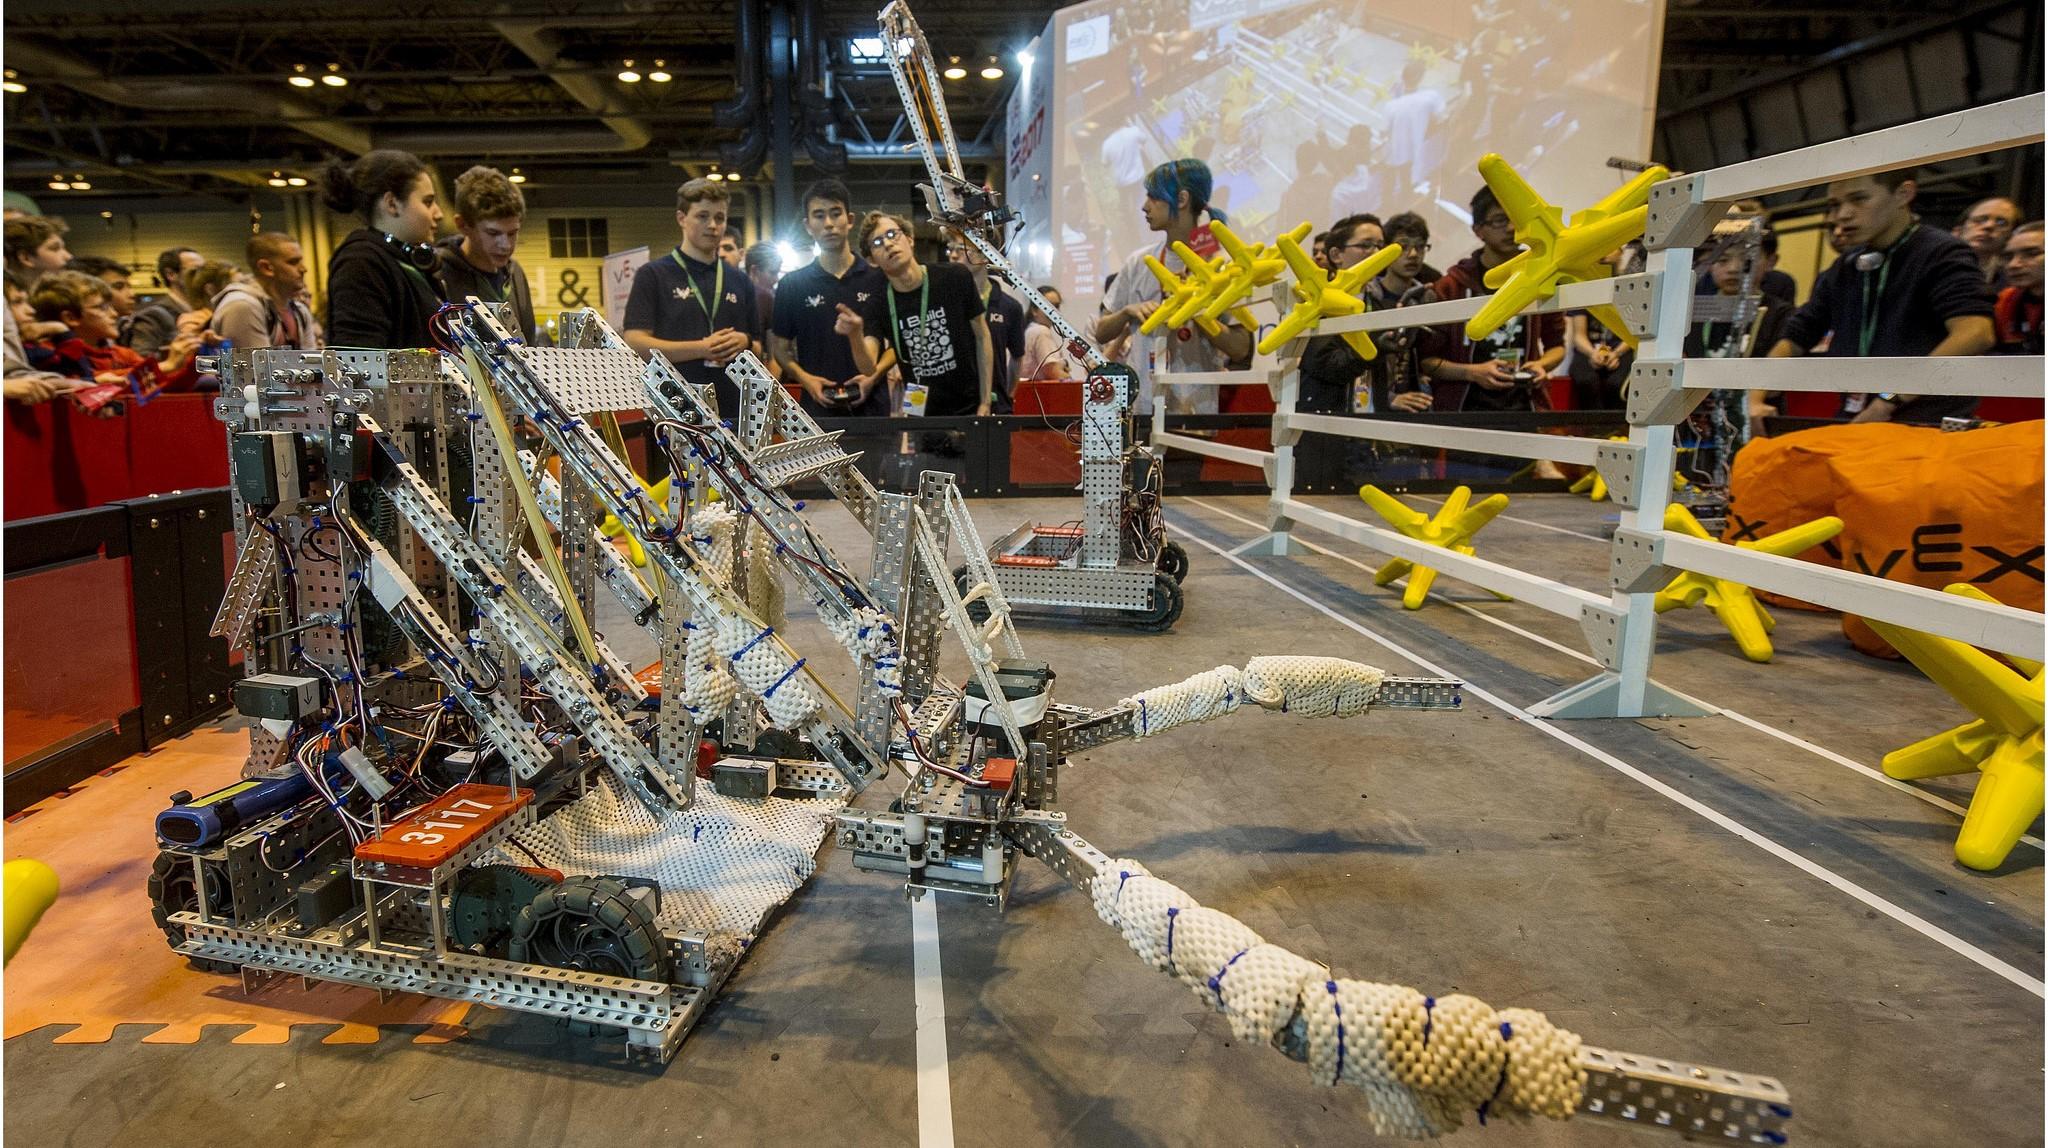 New College Lanarkshire: VEX Robotics Competition